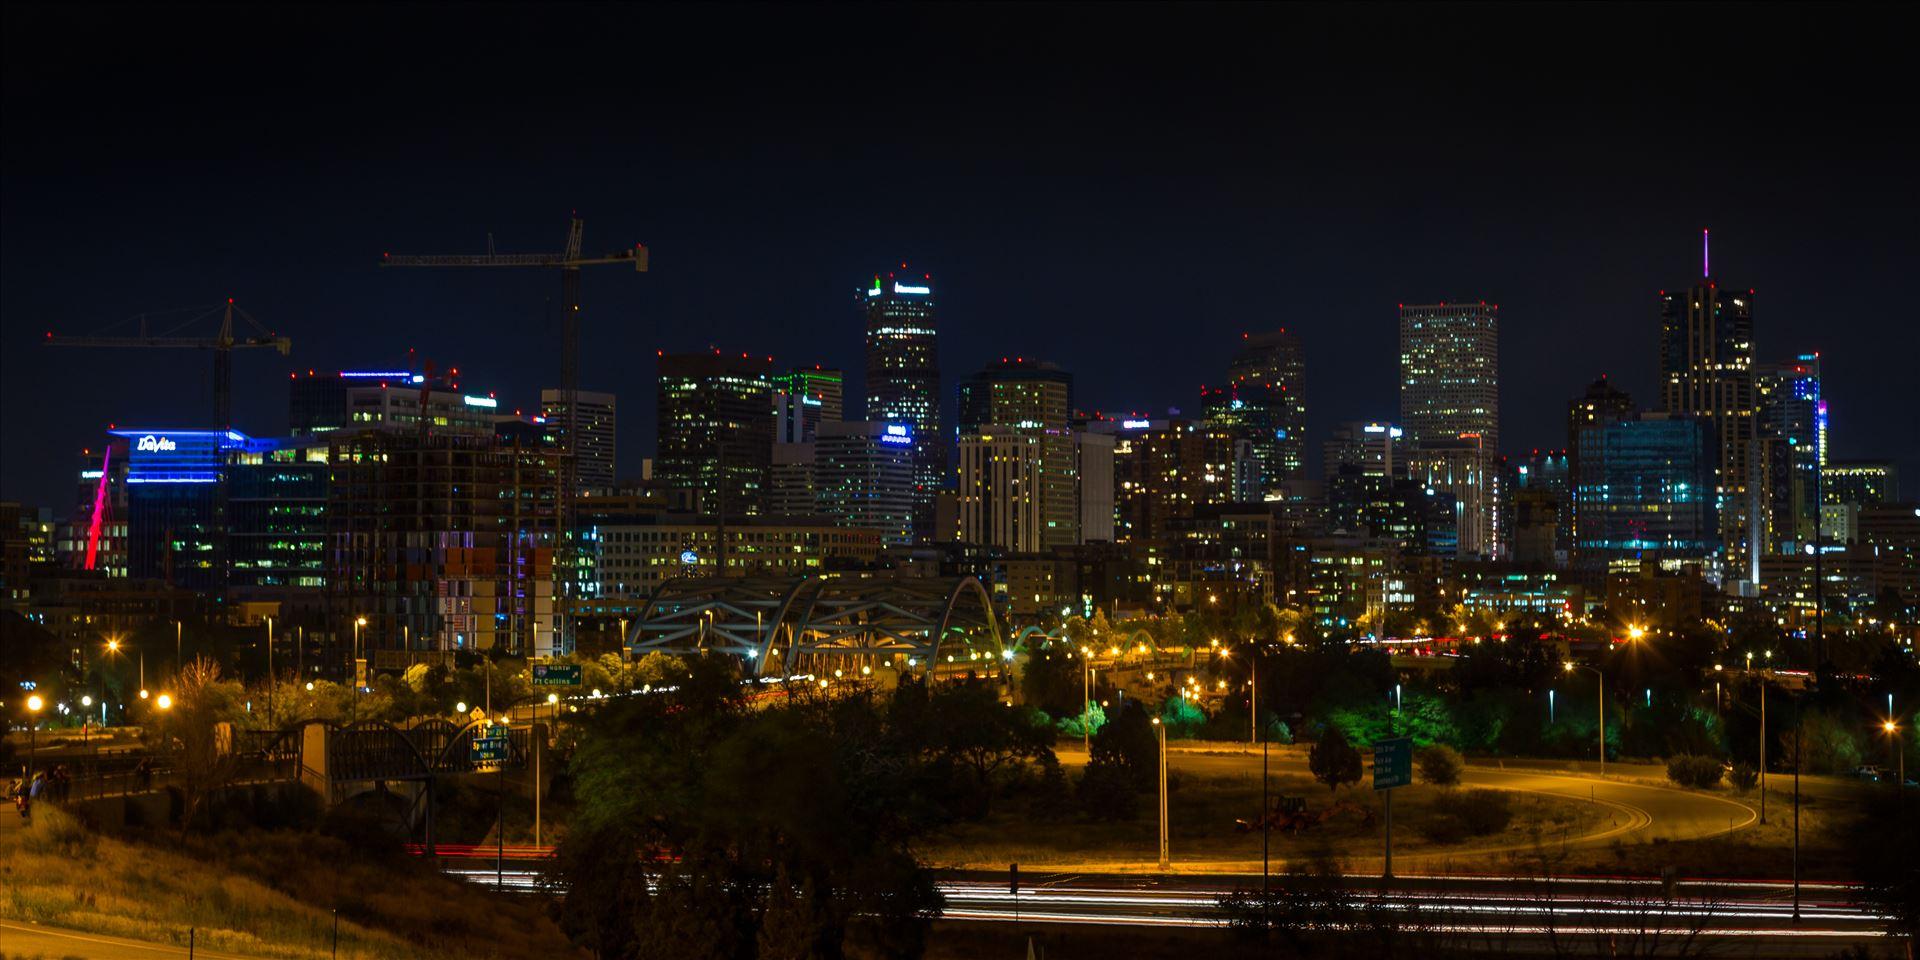 Denver Skyline at Night - The Denver, Colorado skyline at night. by D Scott Smith